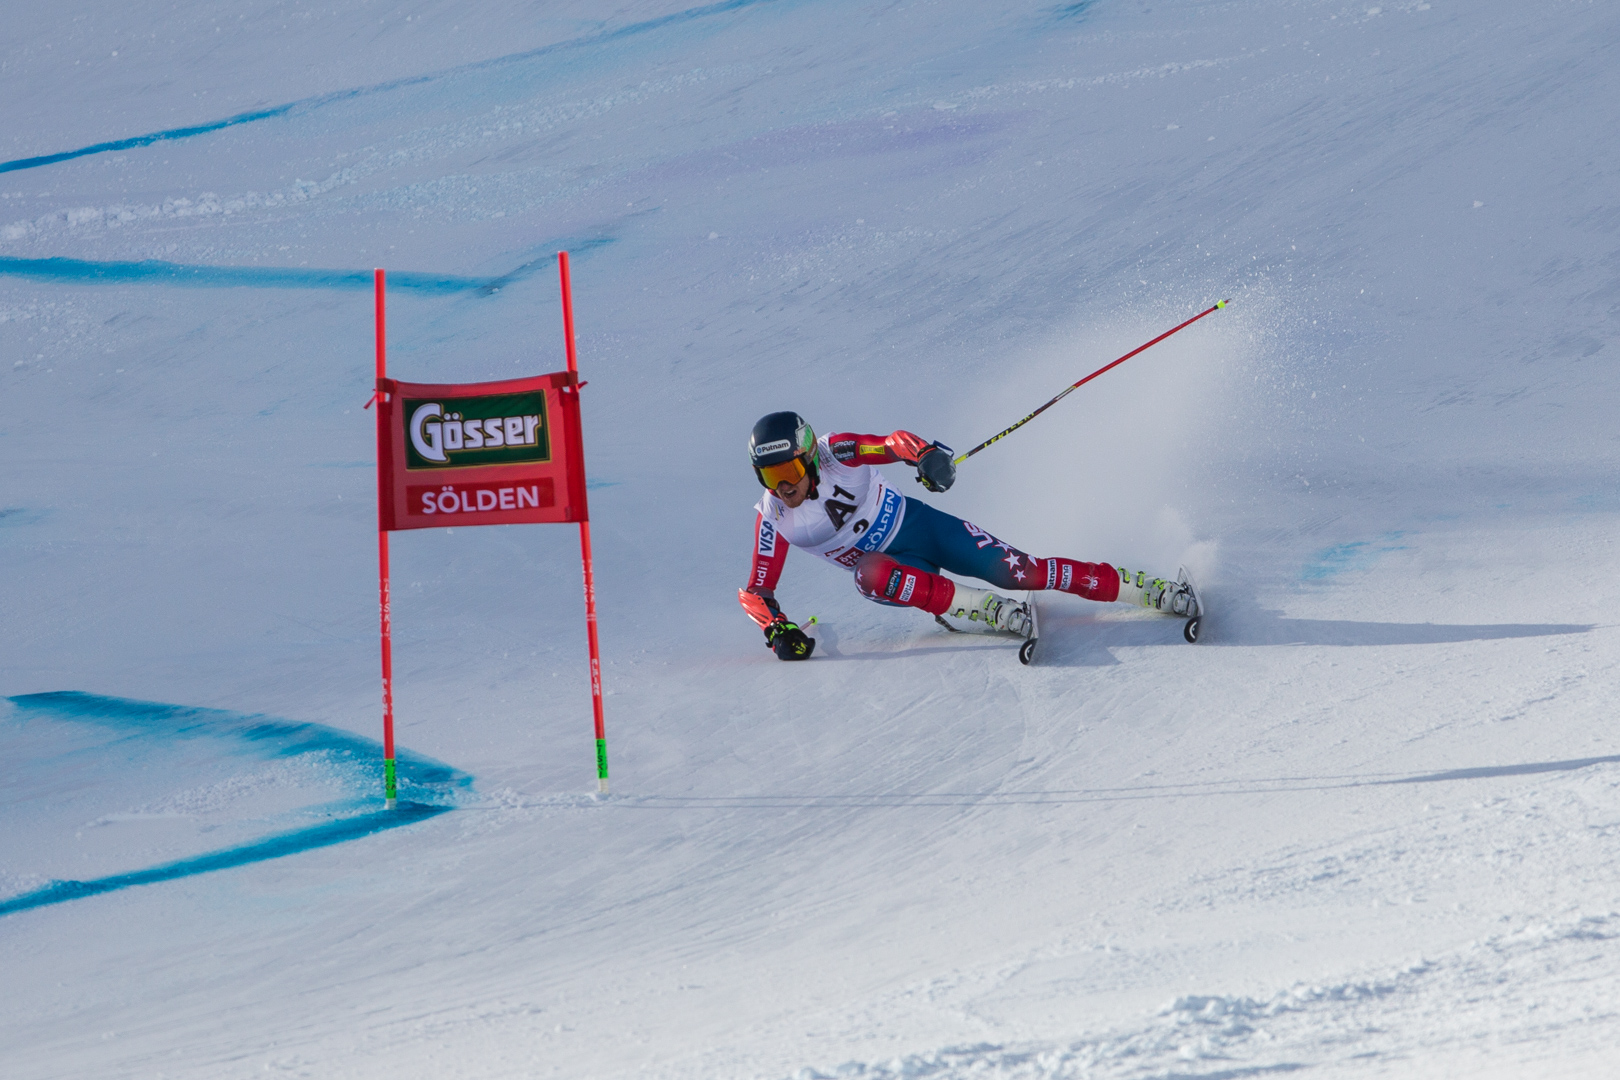 Ted Ligety Solden giant slalom